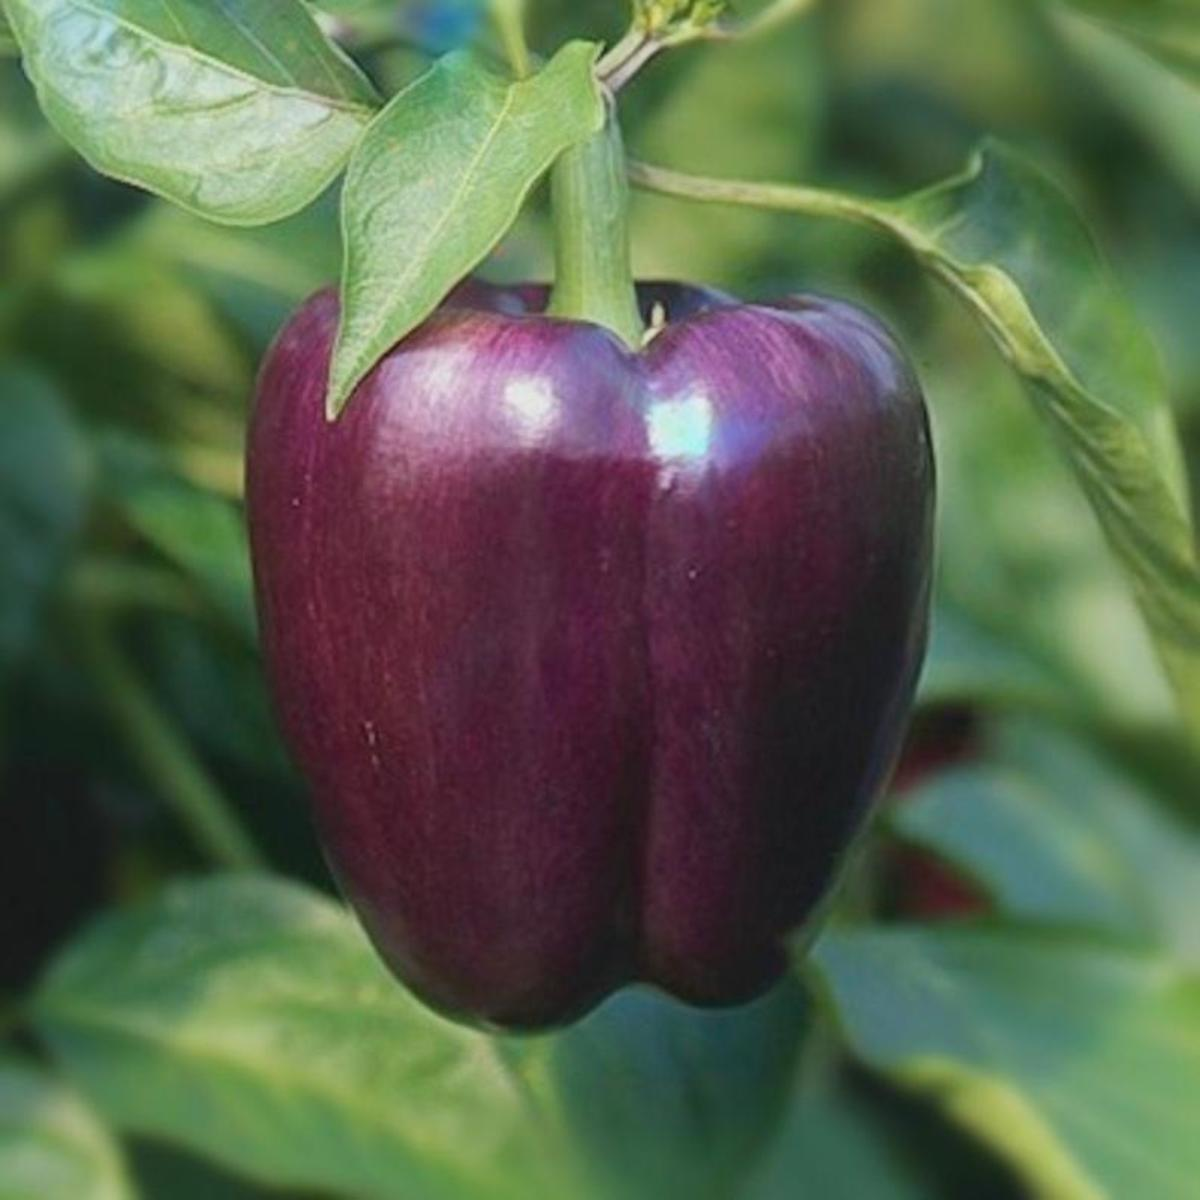 A purple bell pepper is possible...